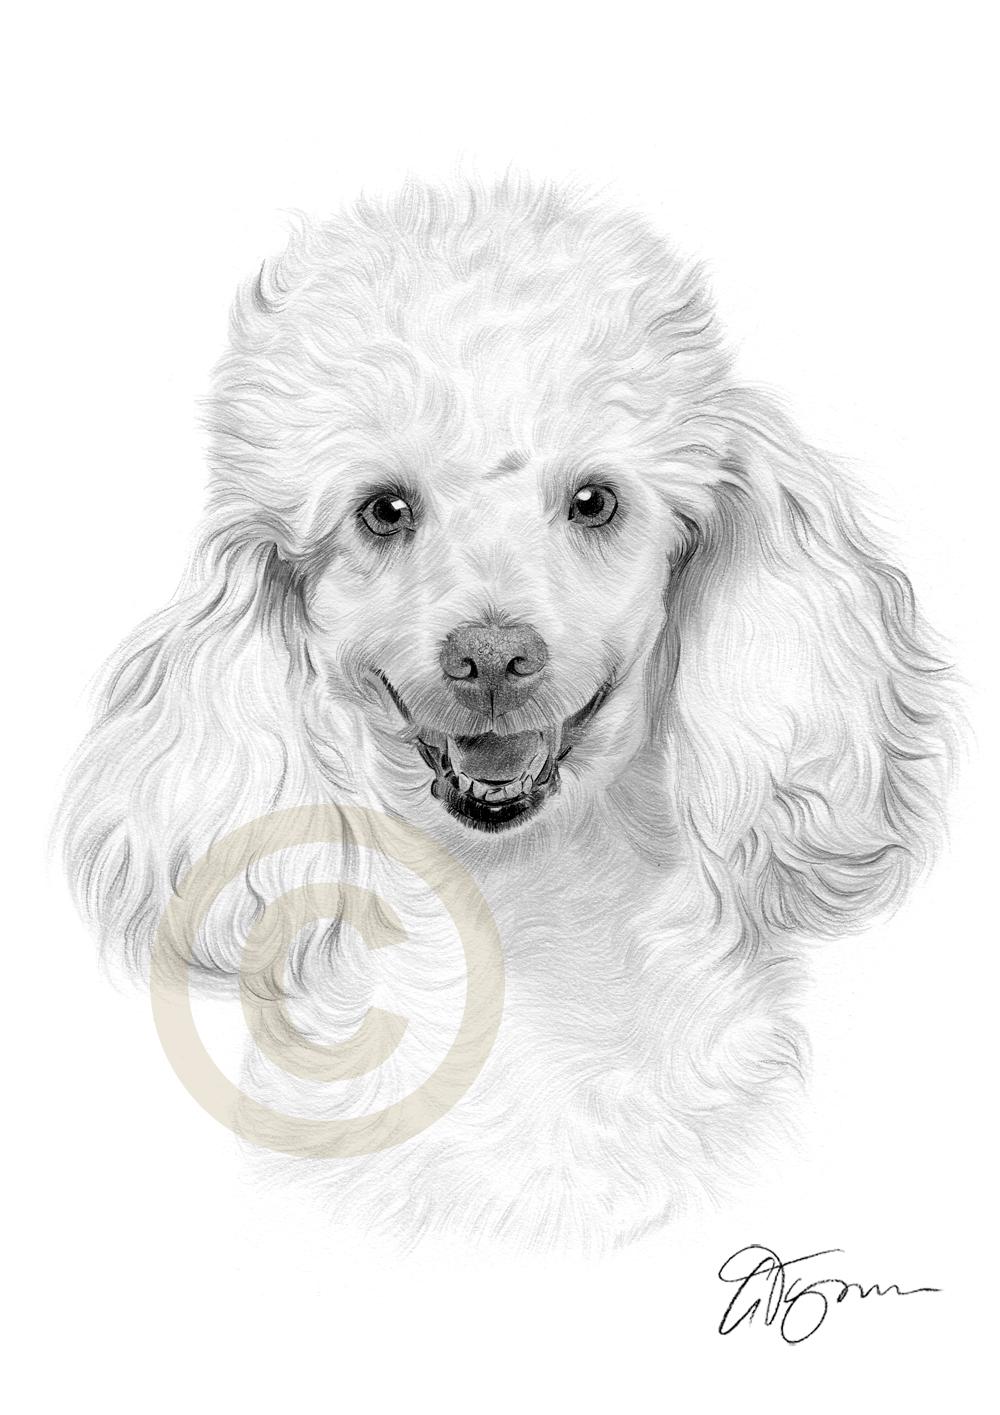 1000x1415 Gary Tymon's Blog Pencil Drawings, Oil And Acrylic Paintings